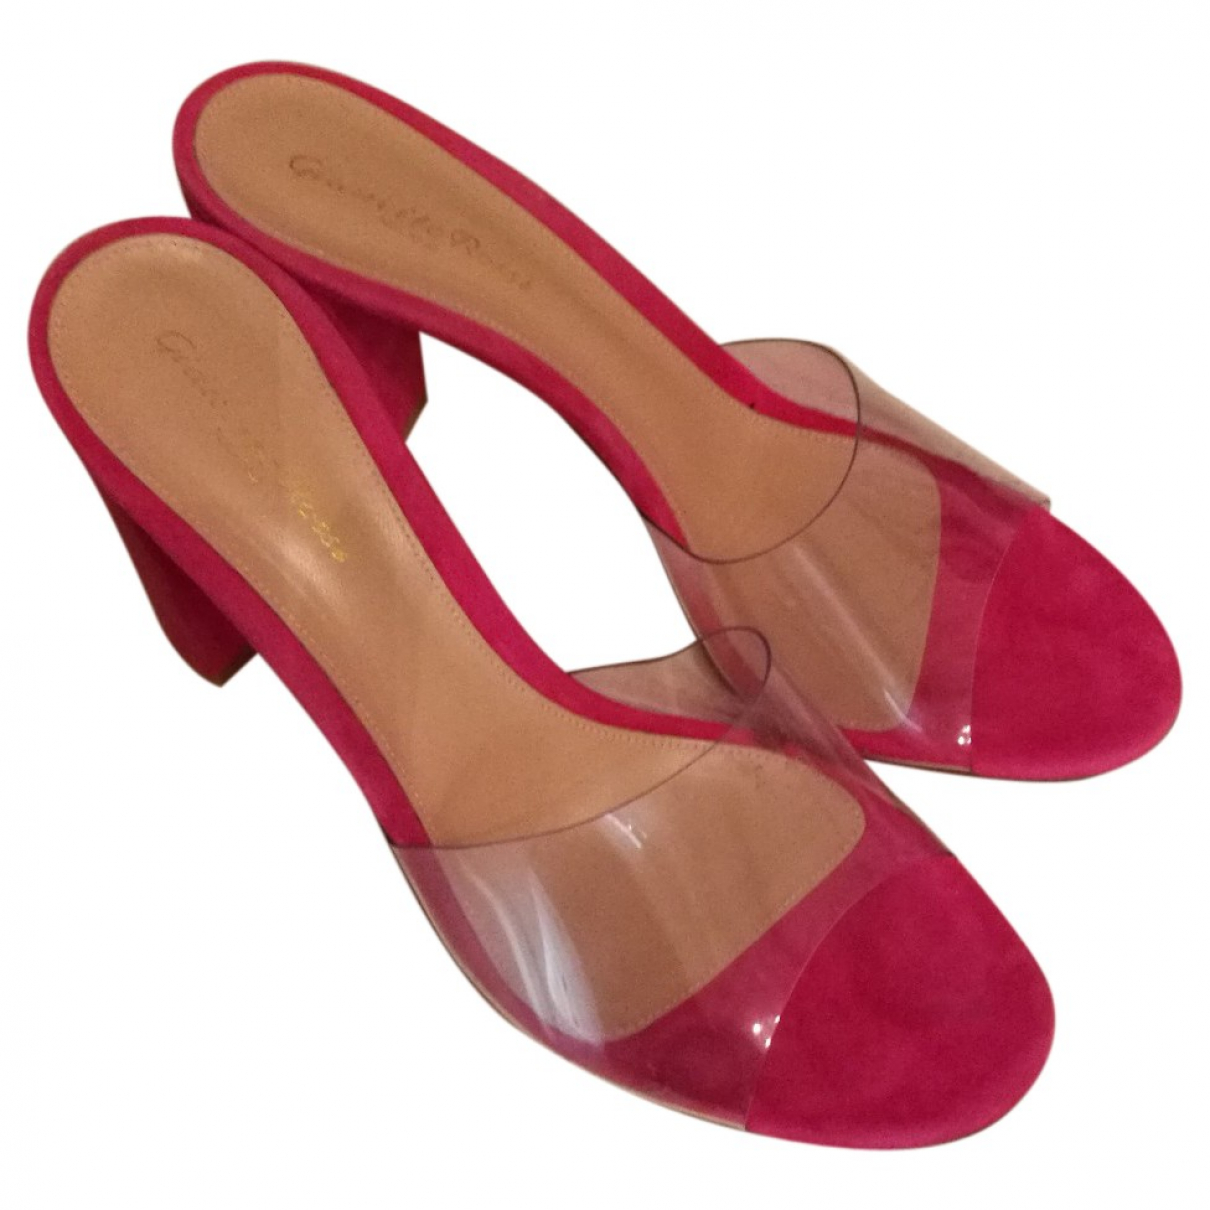 Gianvito Rossi - Sandales   pour femme en suede - rose